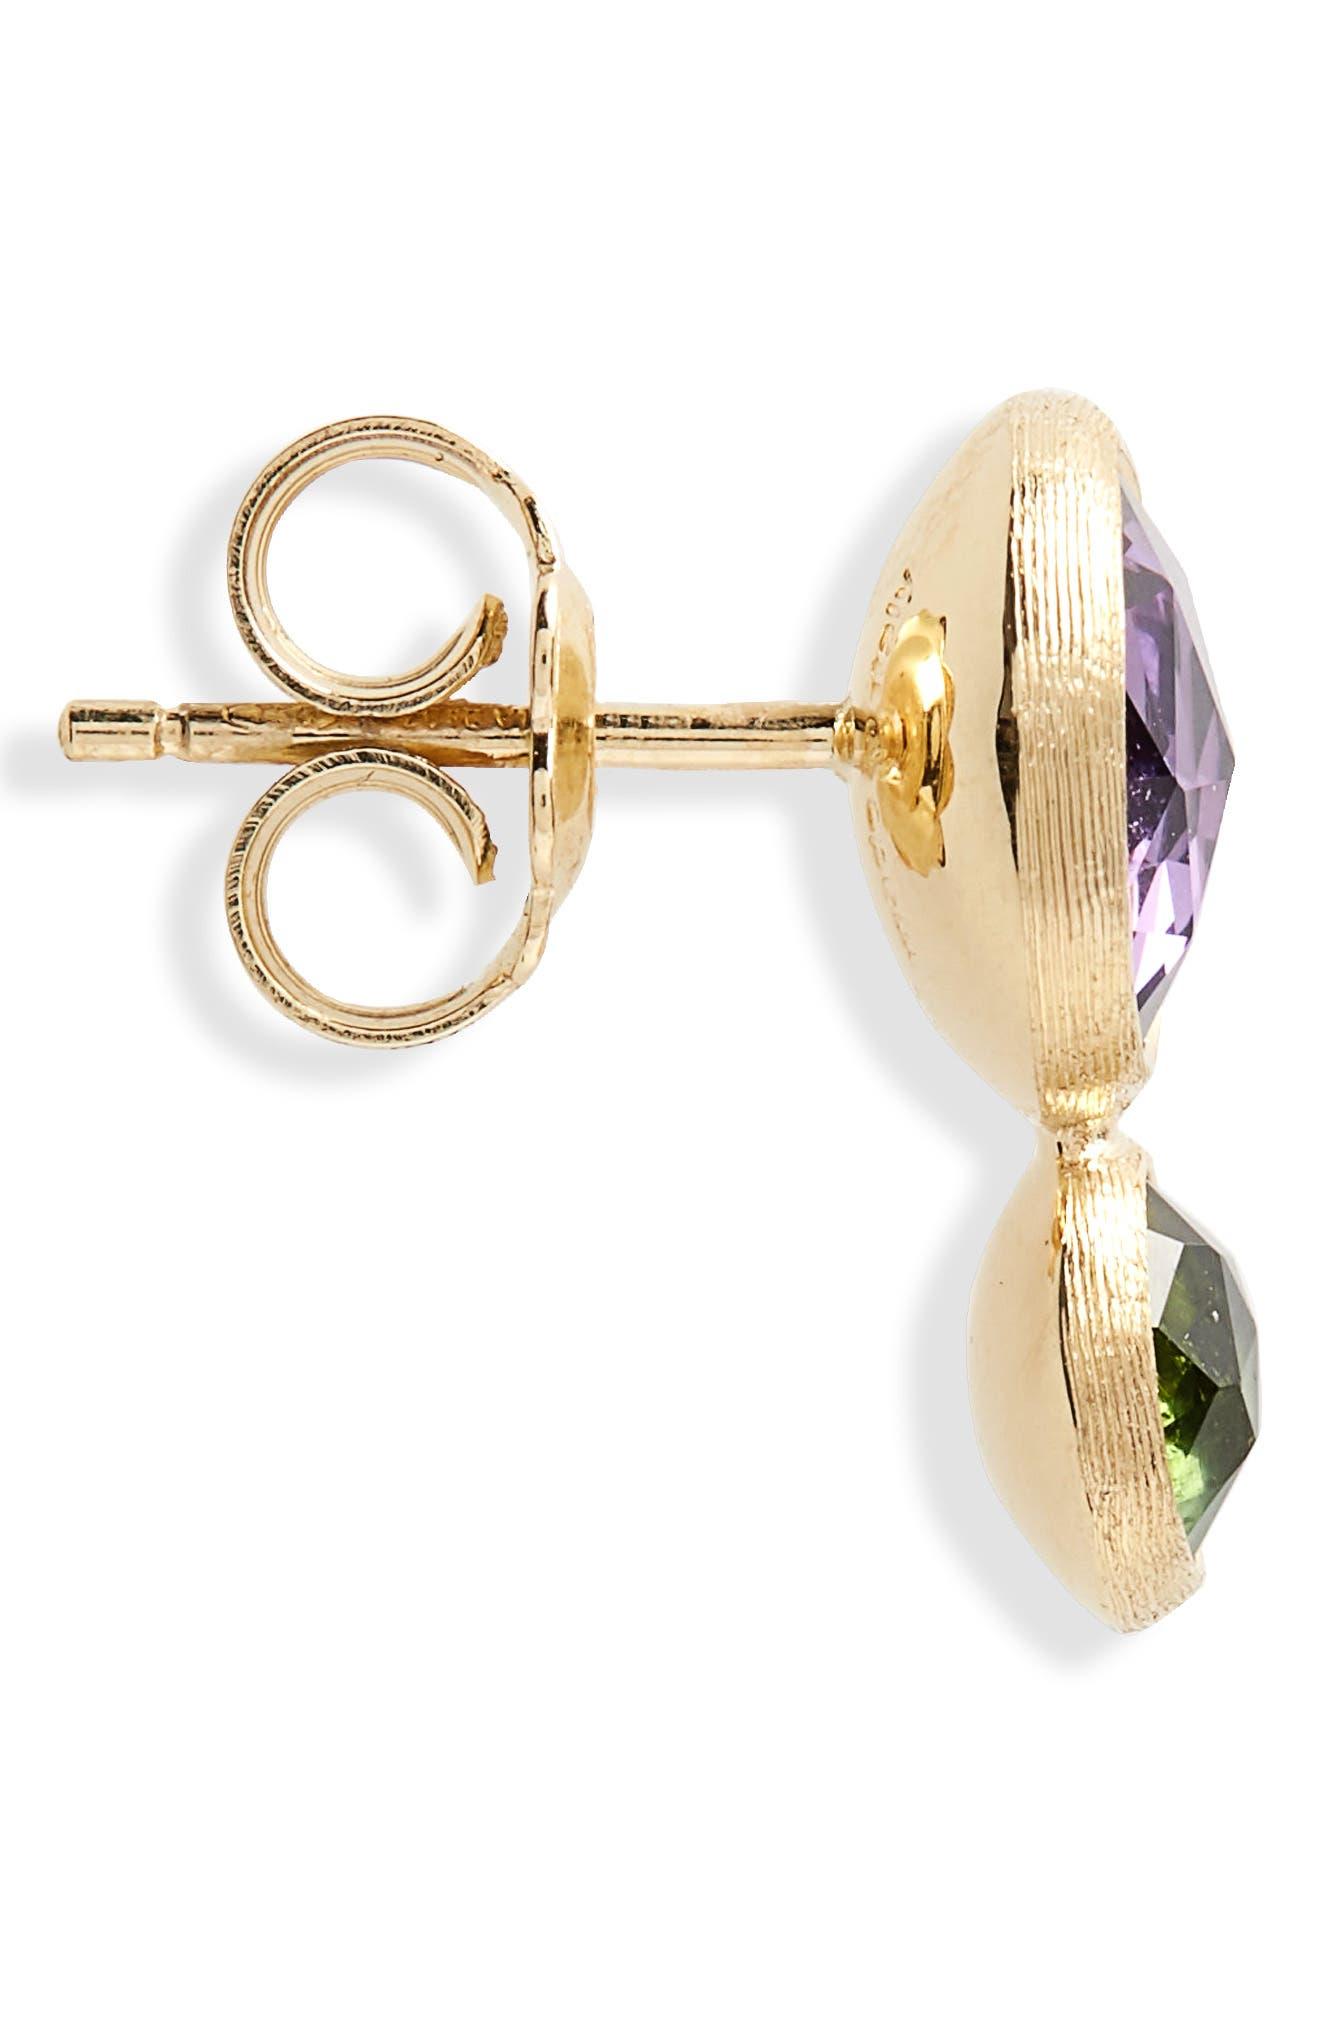 Jaipur Amethyst & Tourmaline Stud Earrings,                             Alternate thumbnail 4, color,                             710